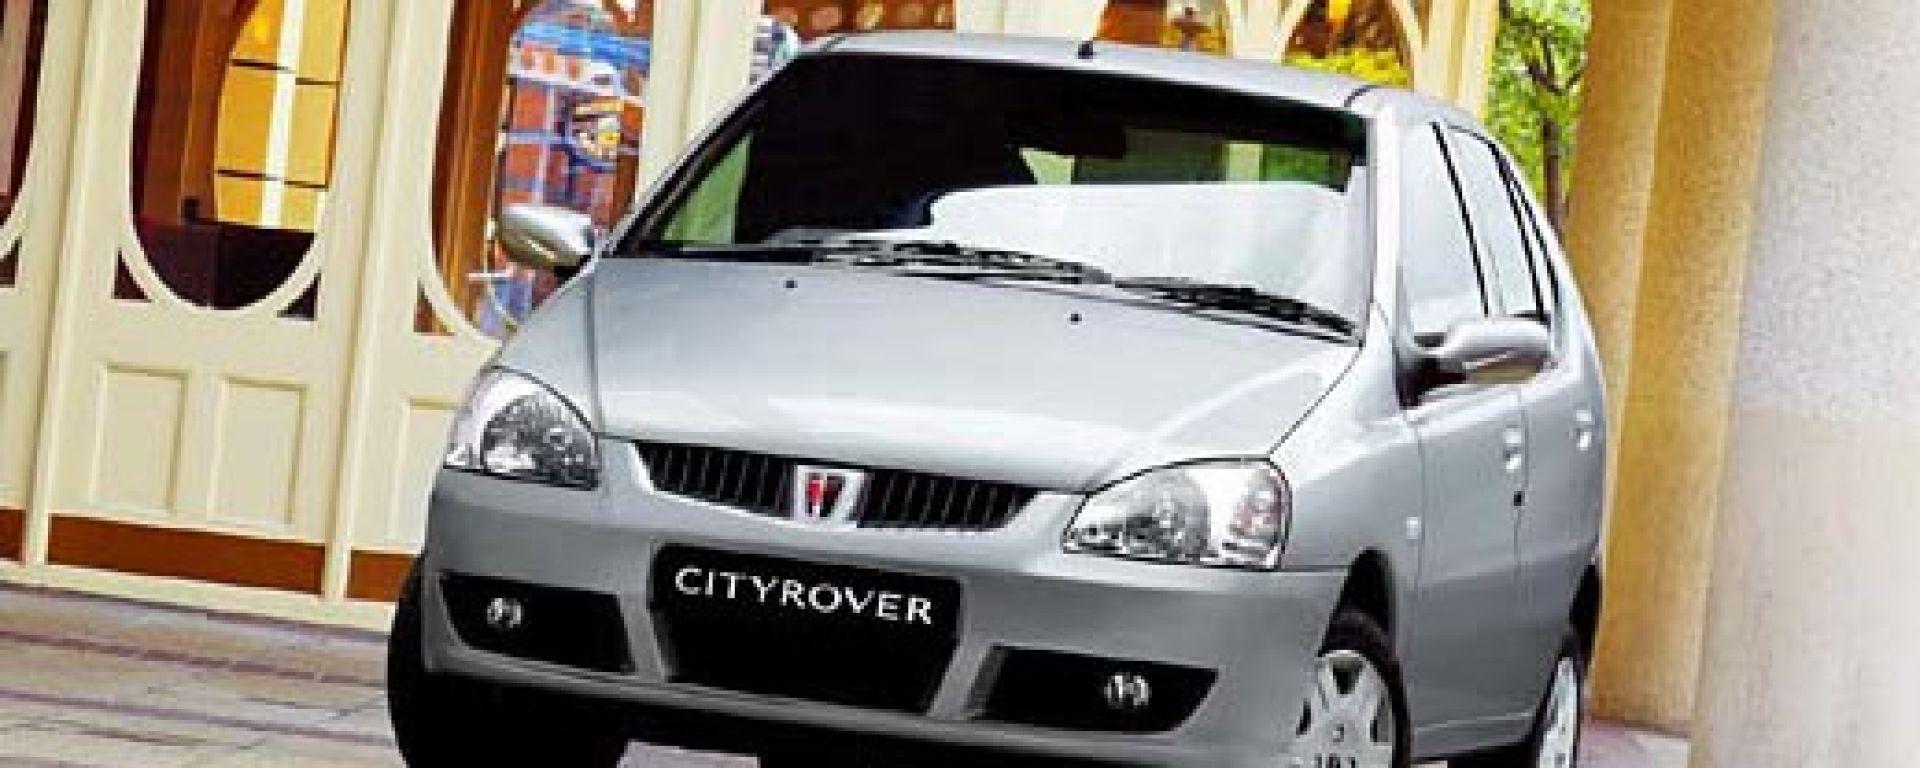 Anteprima: Rover CityRover e Streetwise